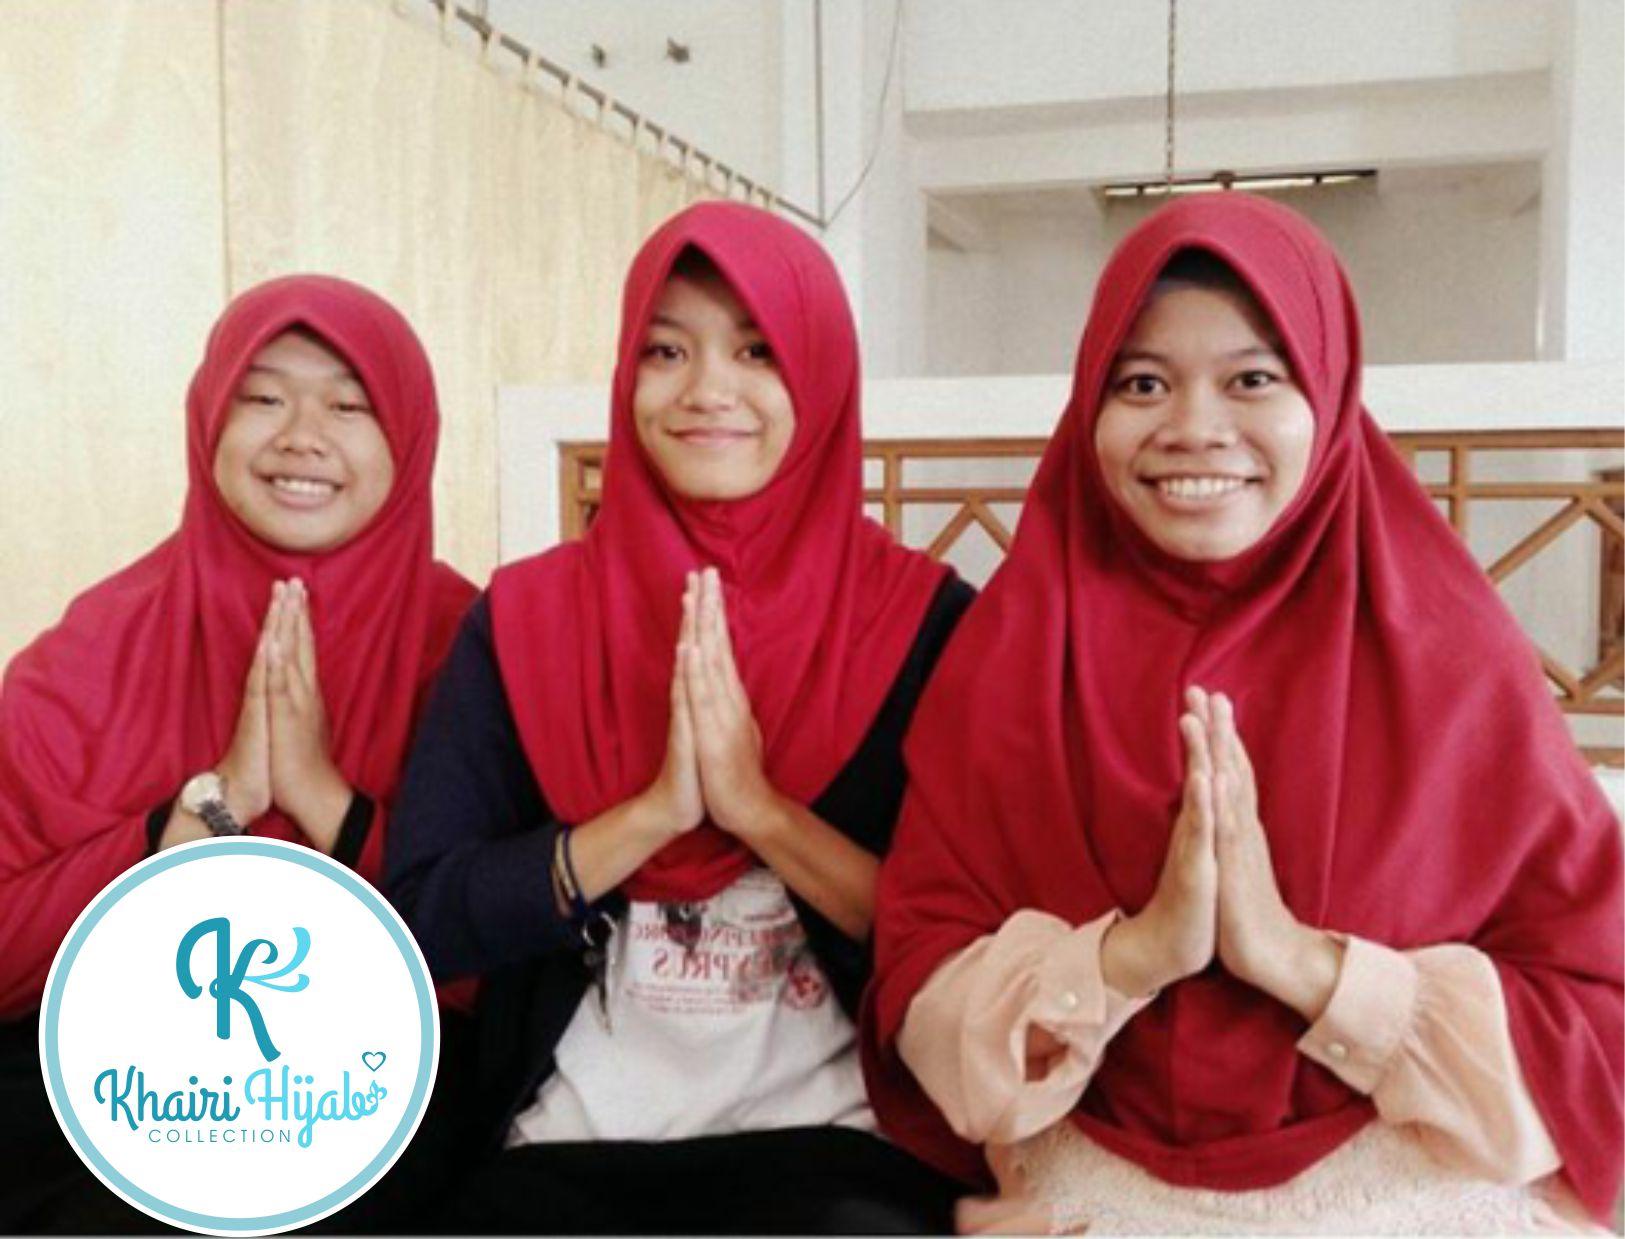 Jual Jilbab Polos Hijab Kaos Jilbab adem Jilbab Sekolah Size XXXL Khairi Hijab